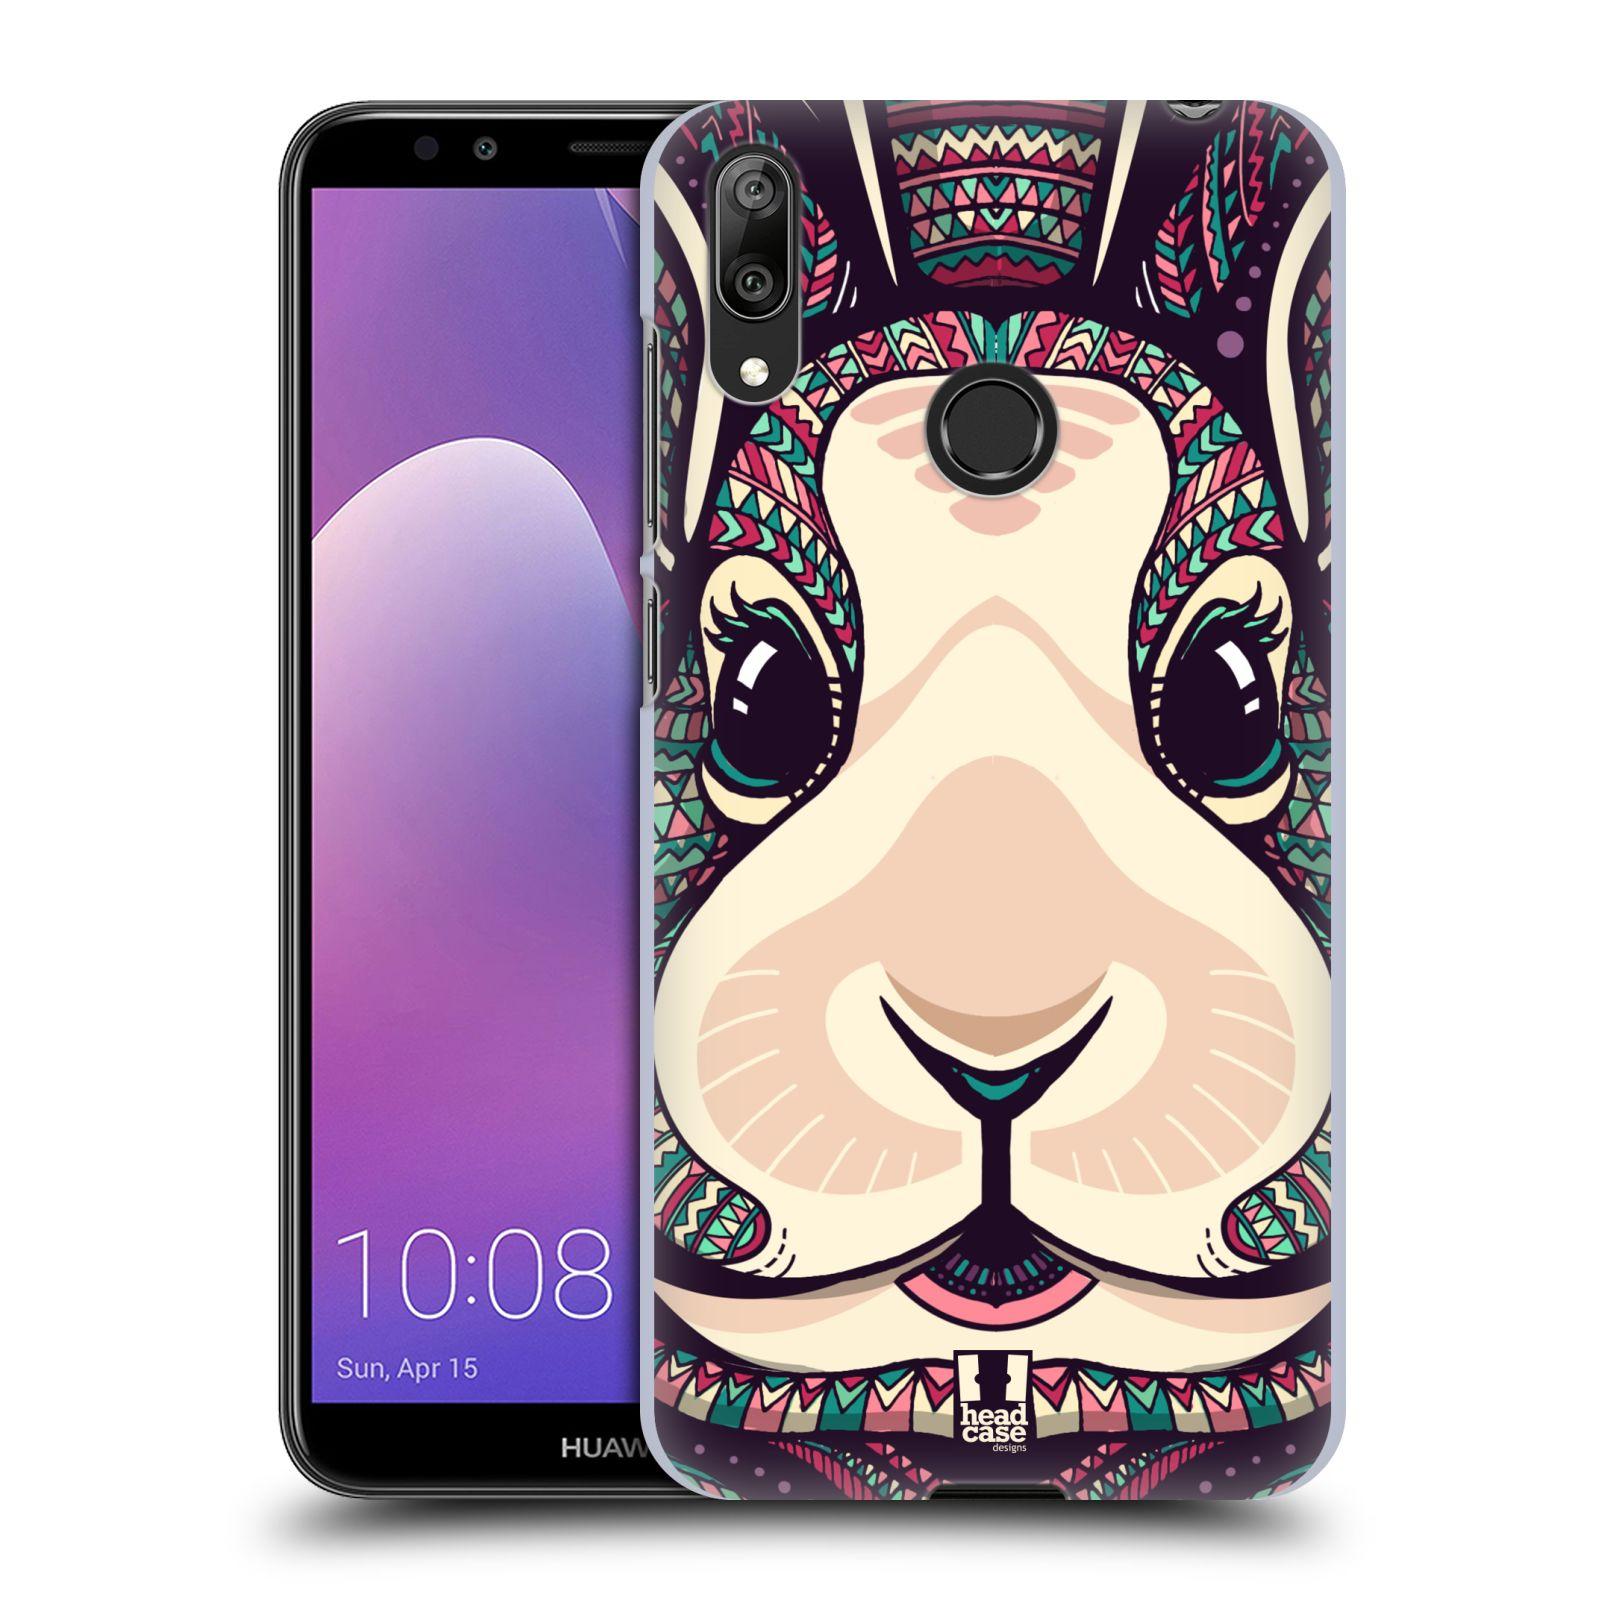 Plastové pouzdro na mobil Huawei Y7 (2019) - Head Case - AZTEC ZAJÍČEK